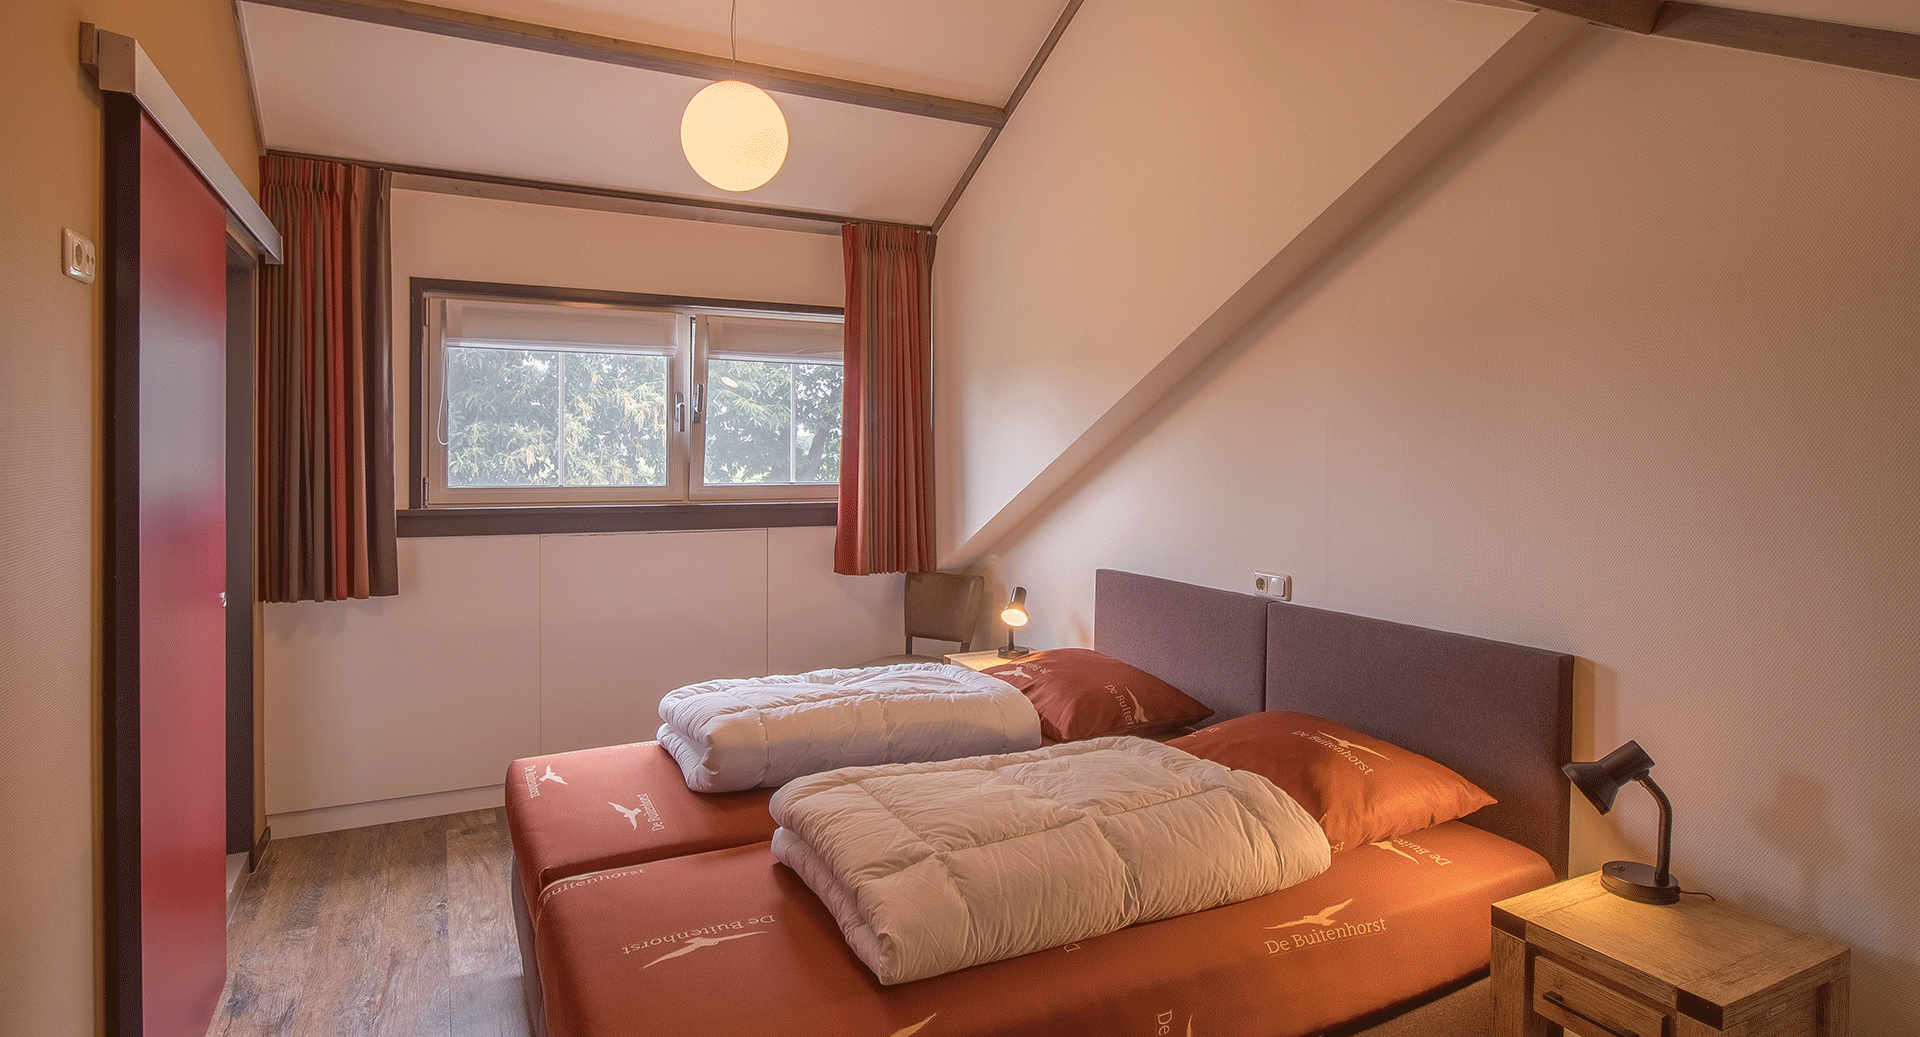 Slaapkamer-4-Ouwe-Stal